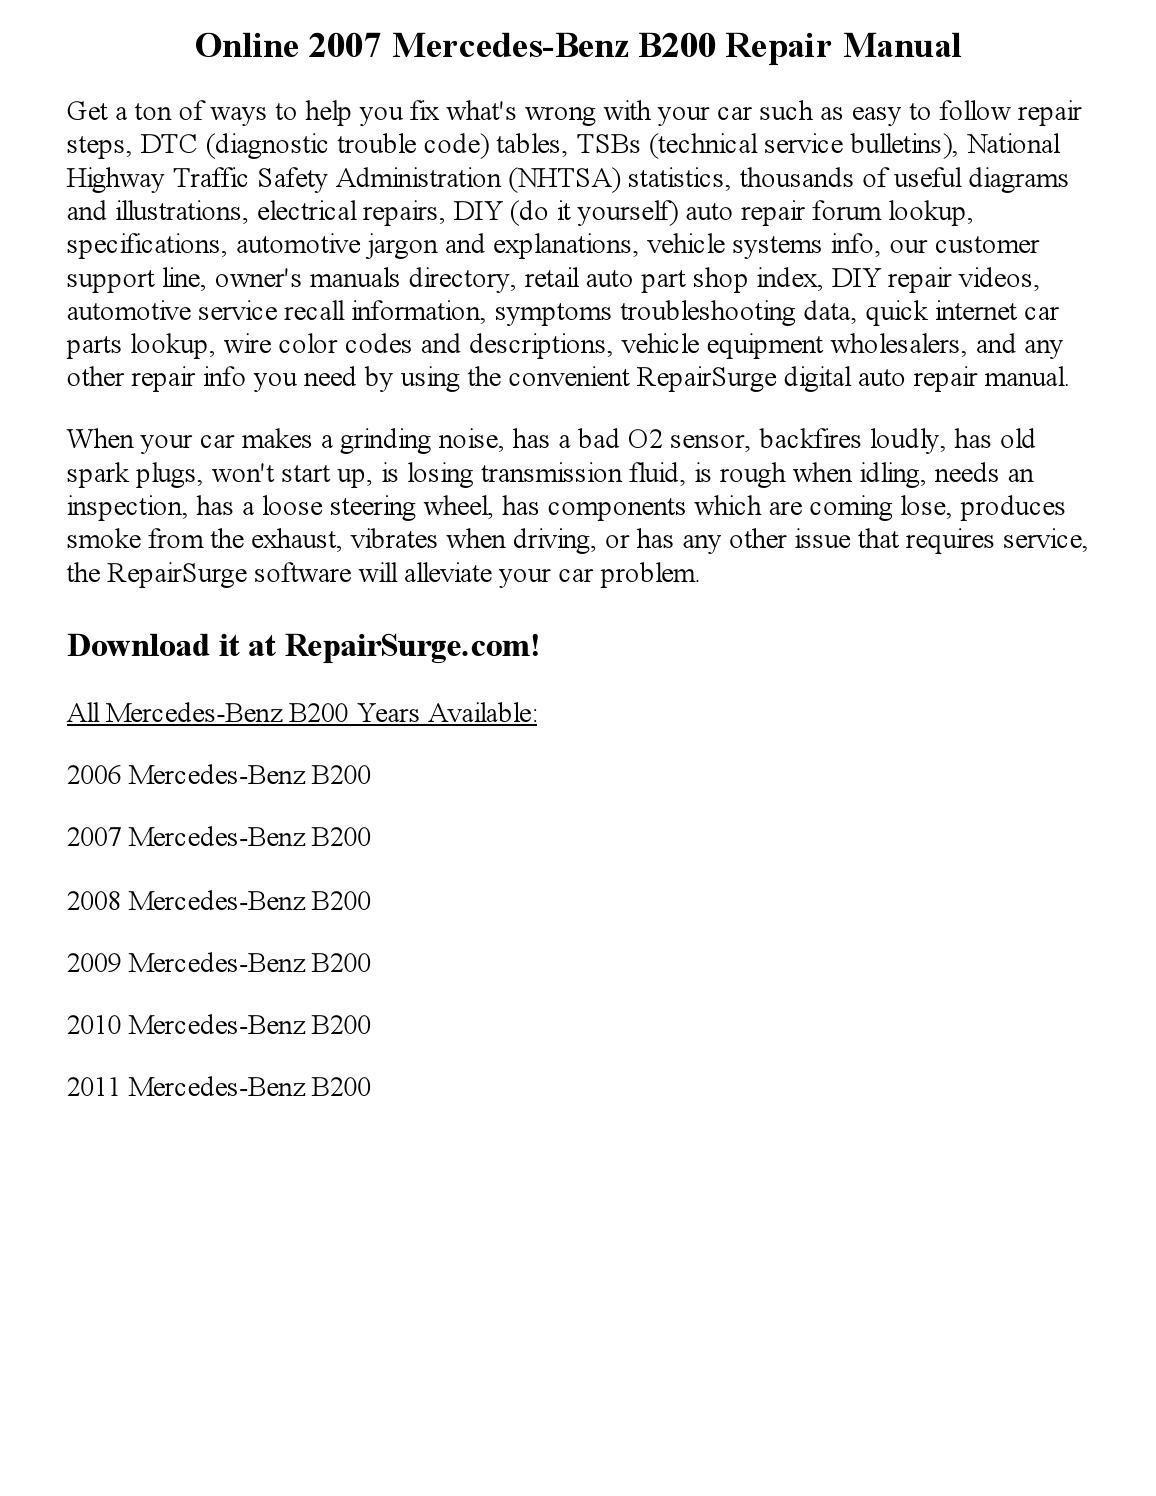 2007 Mercedes Benz B200 Repair Manual Online By Newyork444